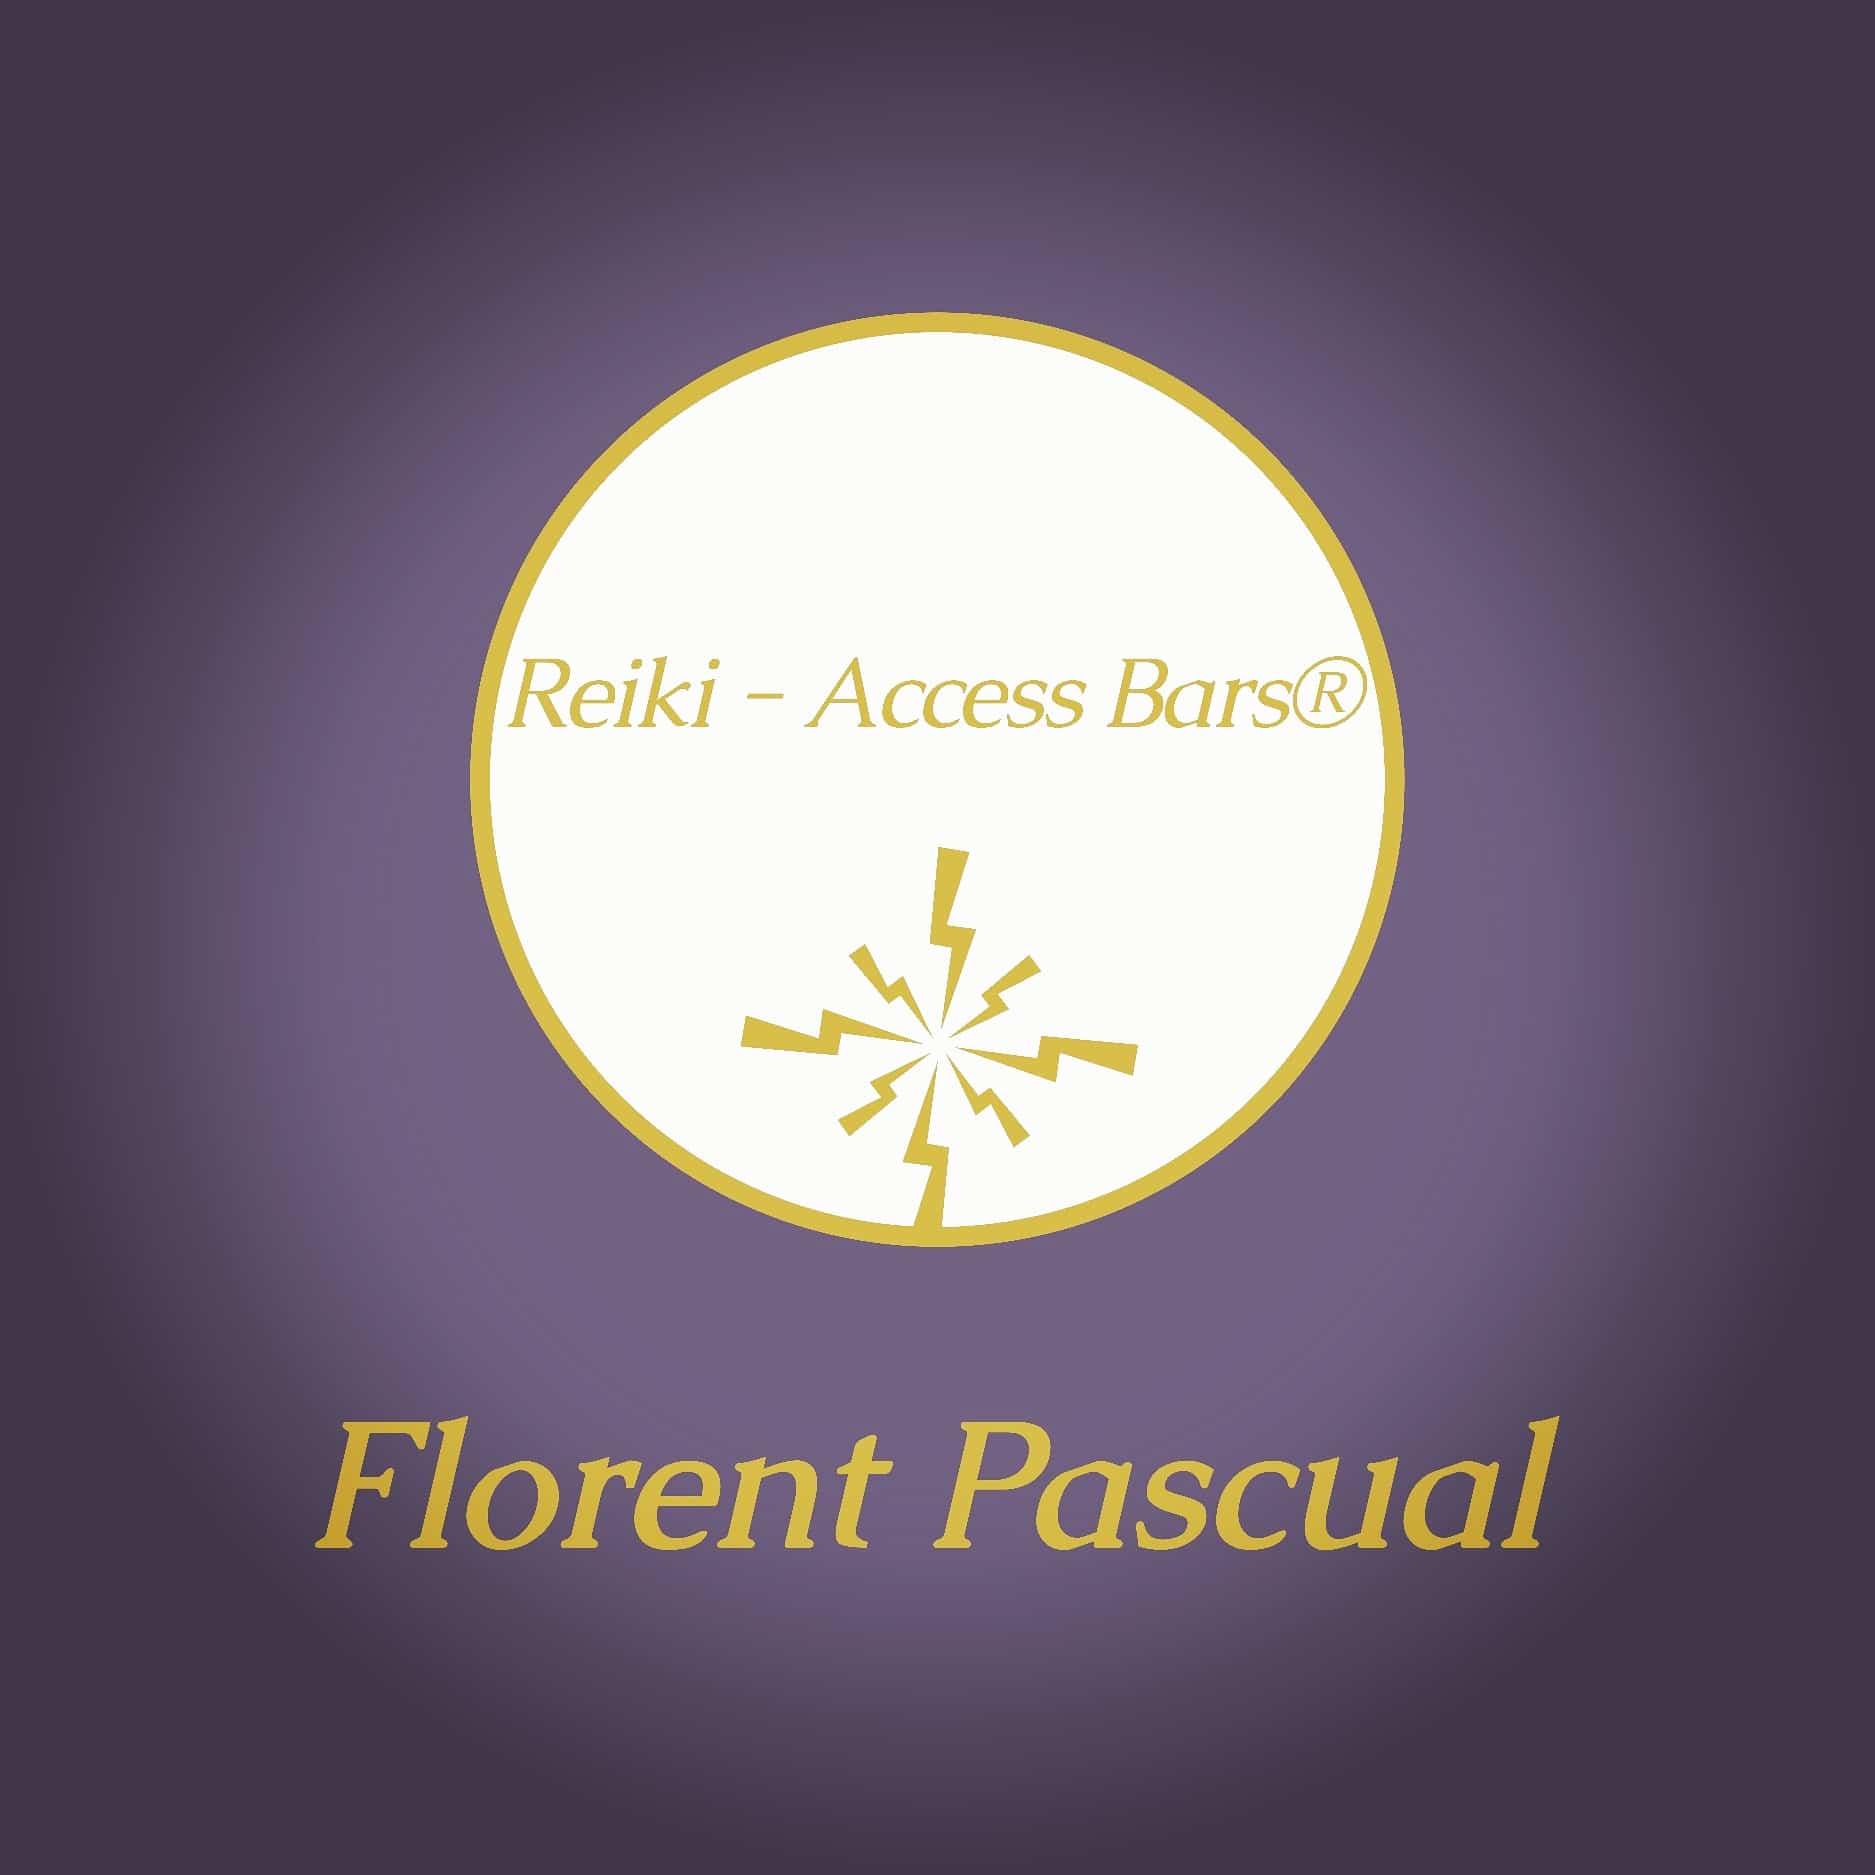 Florent Pascual, Reiki & Access Bars®